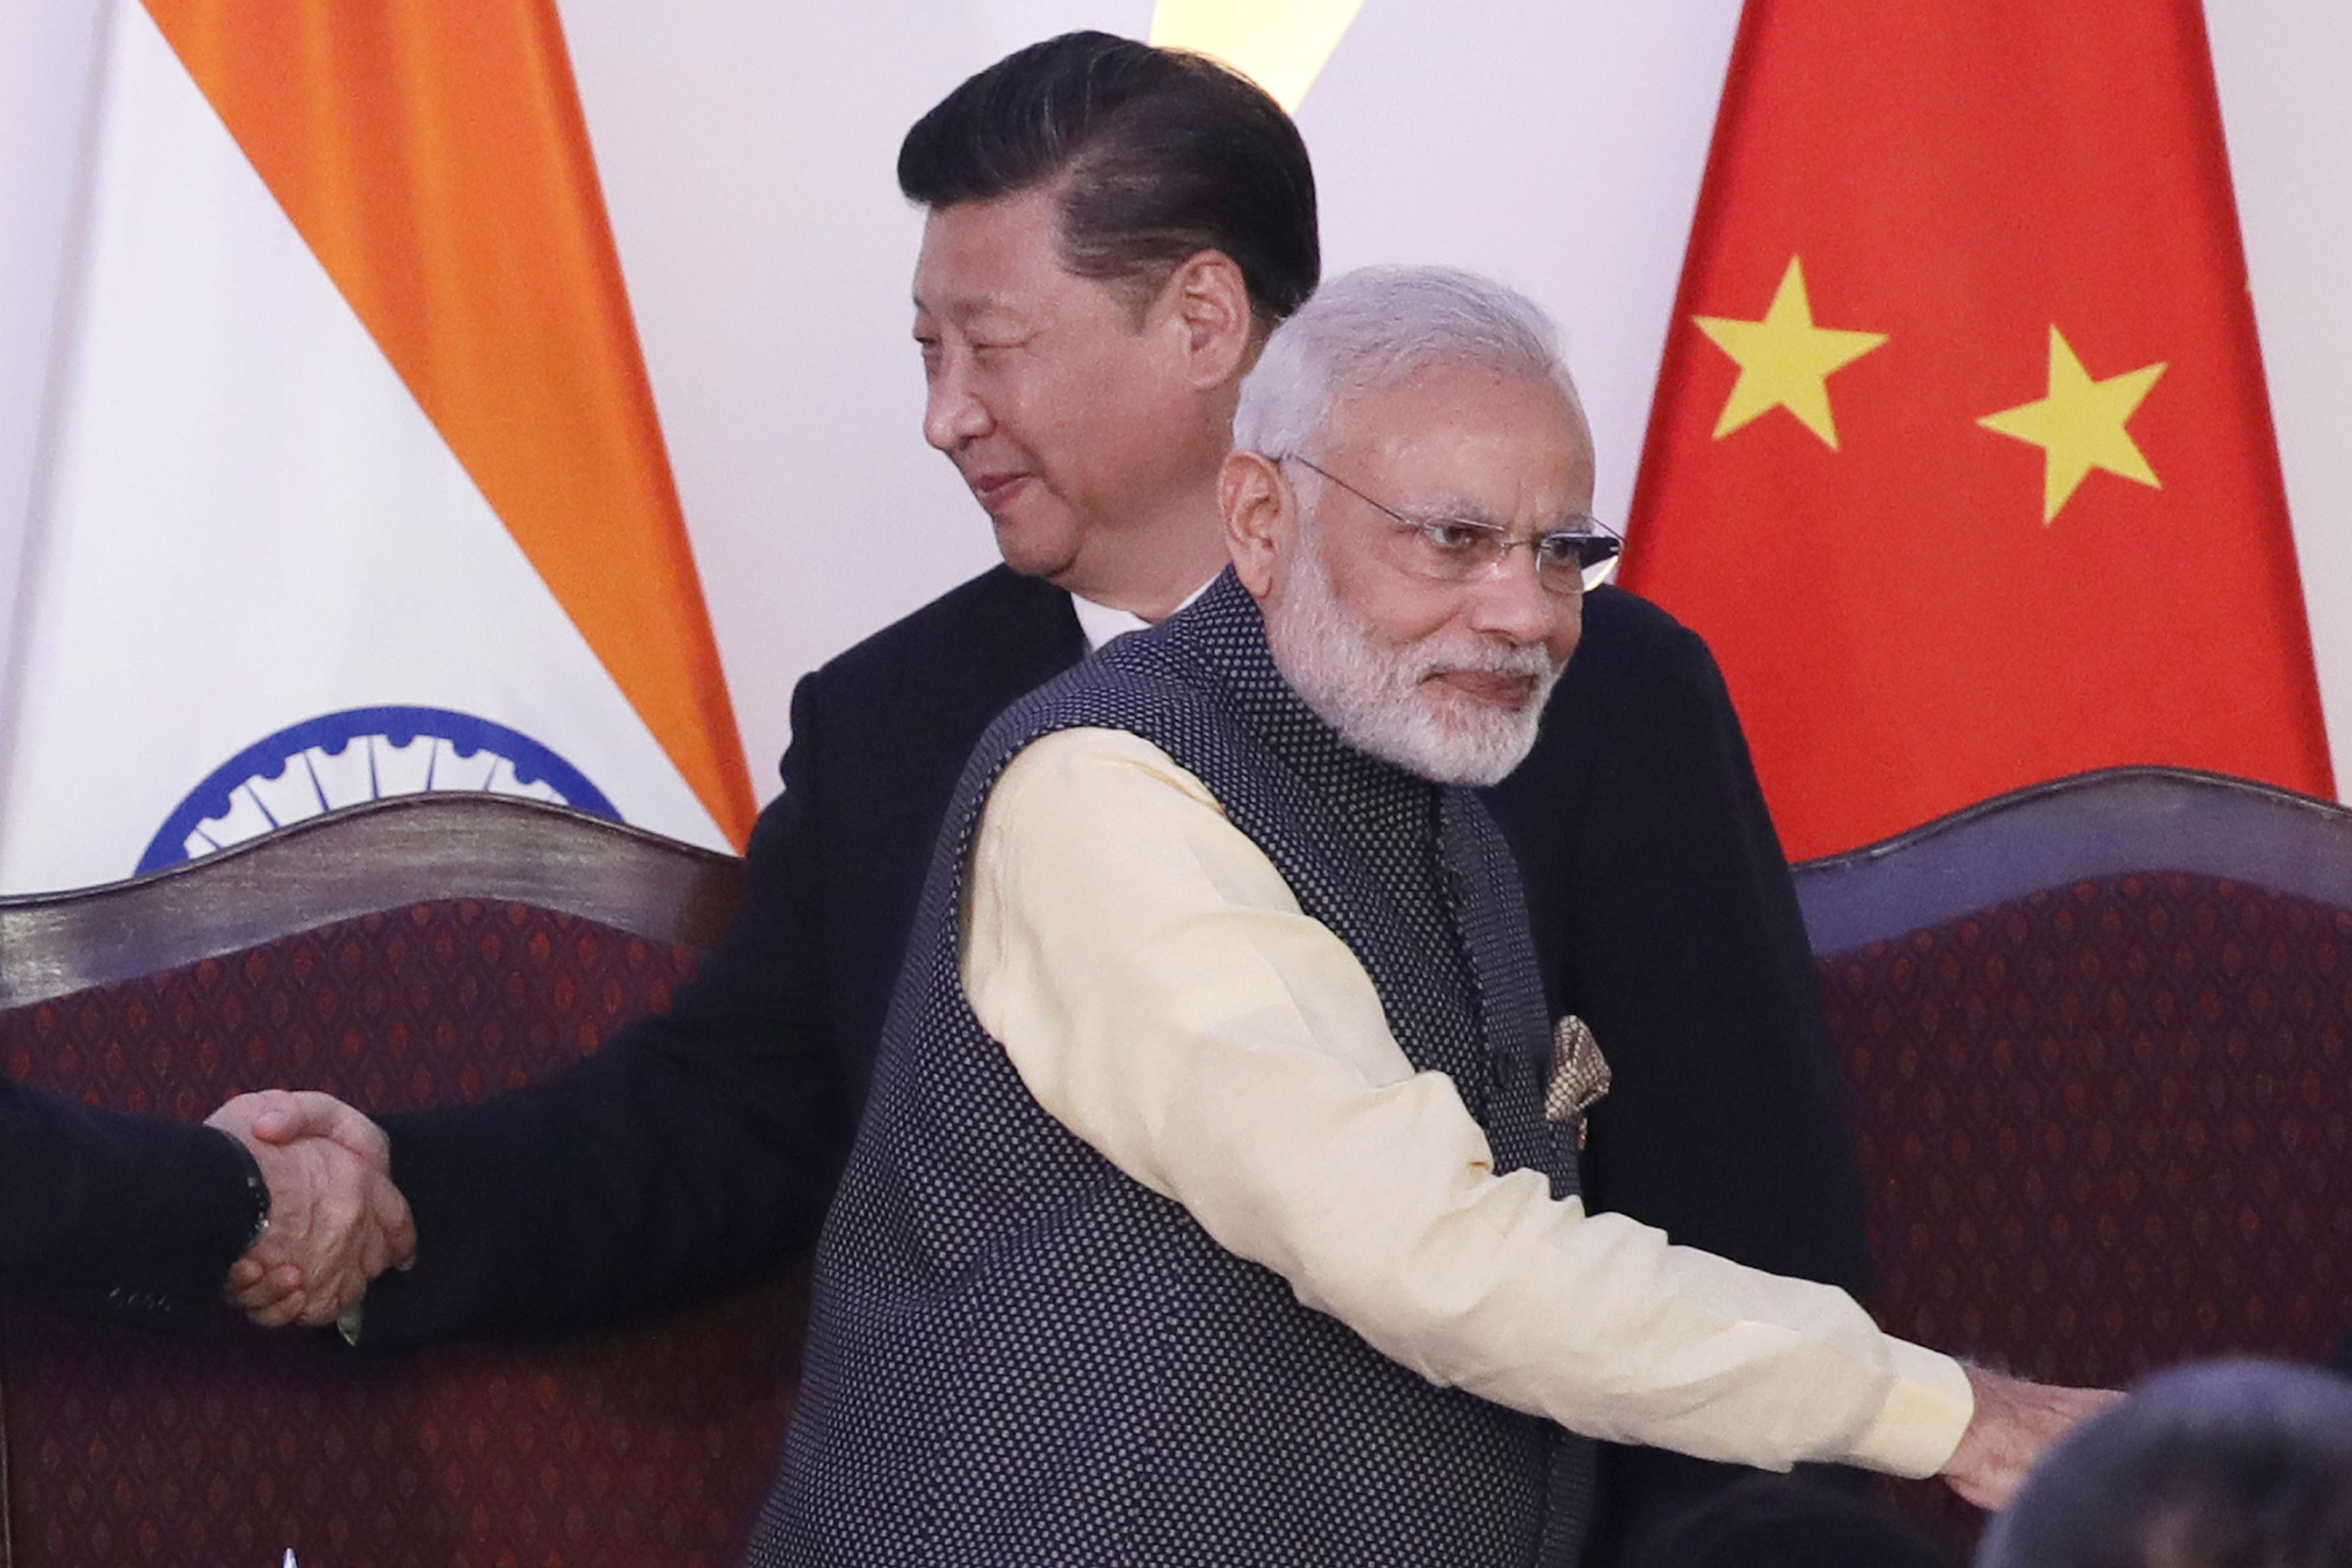 Modi visits military base close to China amid standoff